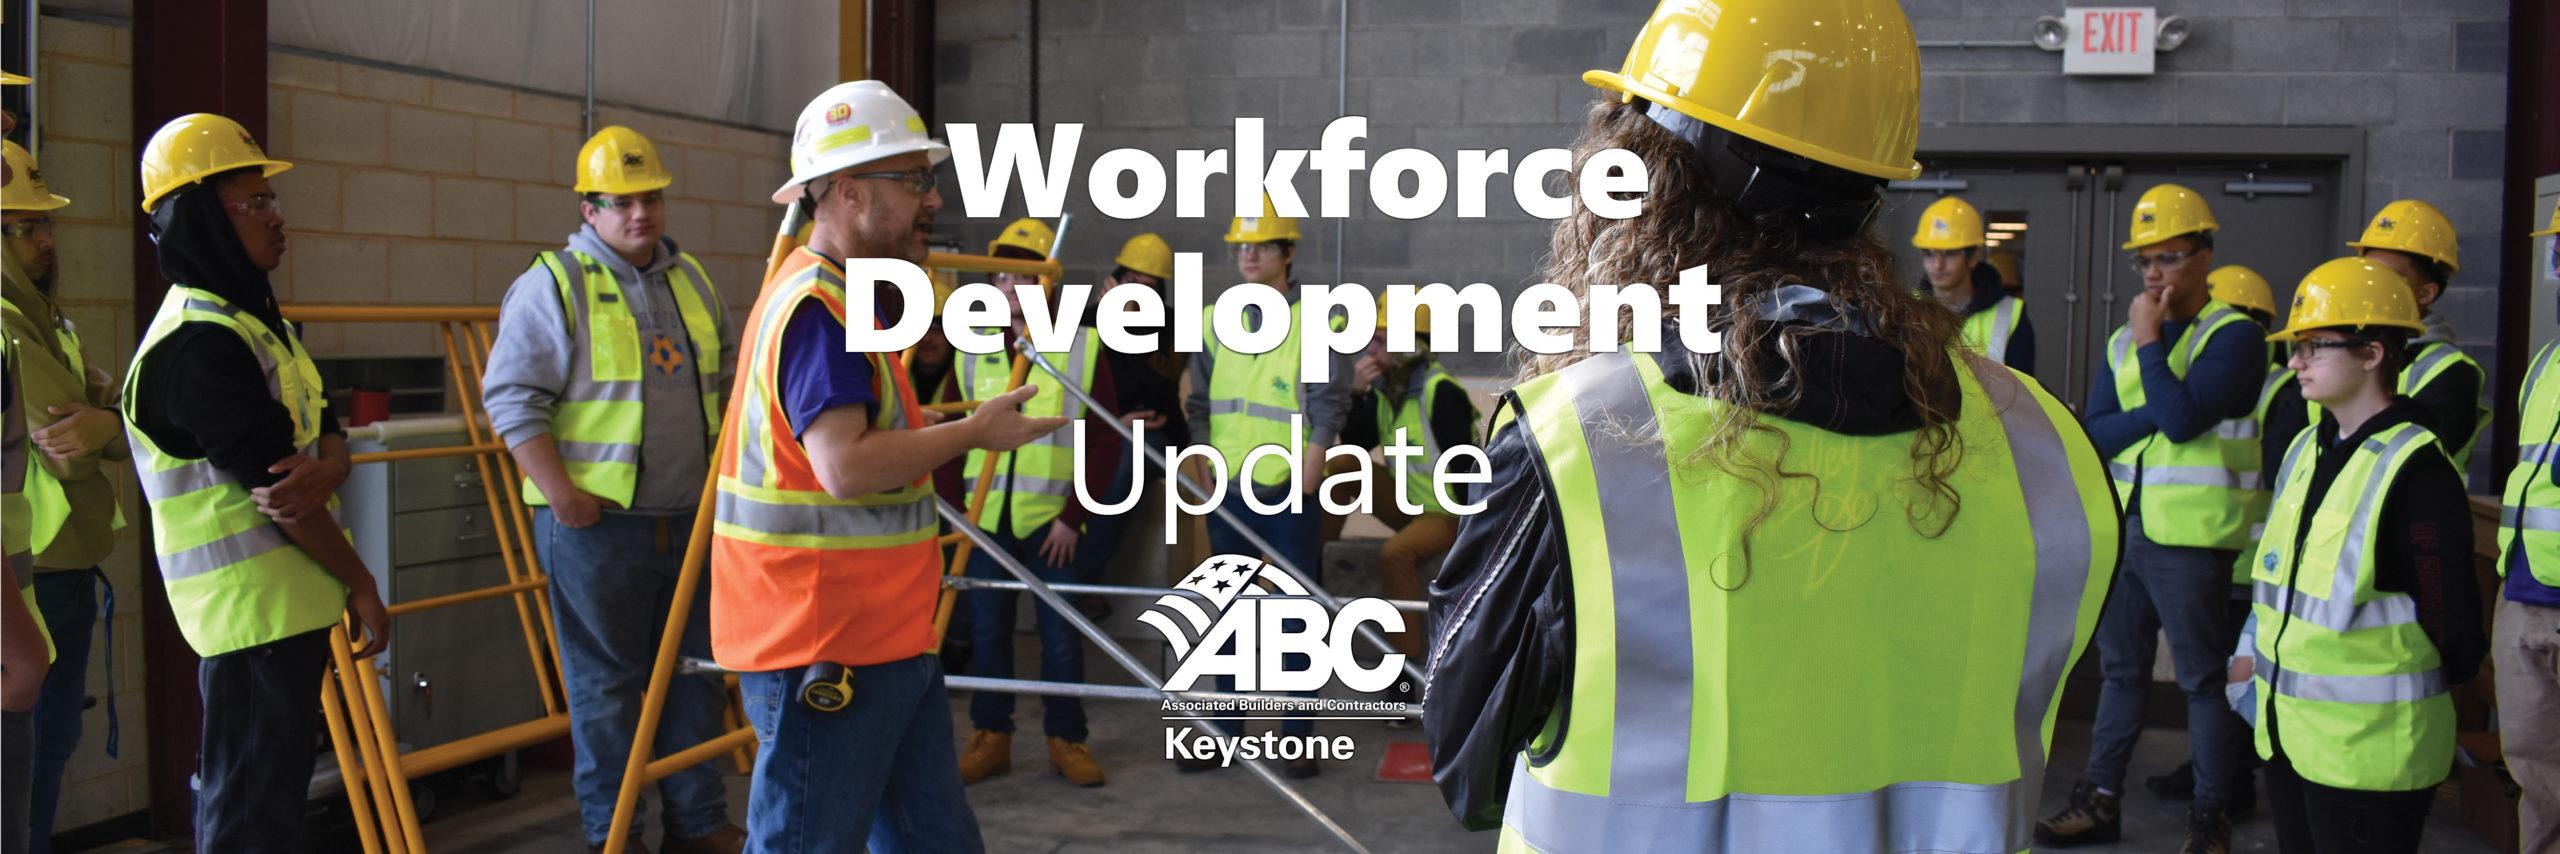 Workforce Development Update ABC Keystone